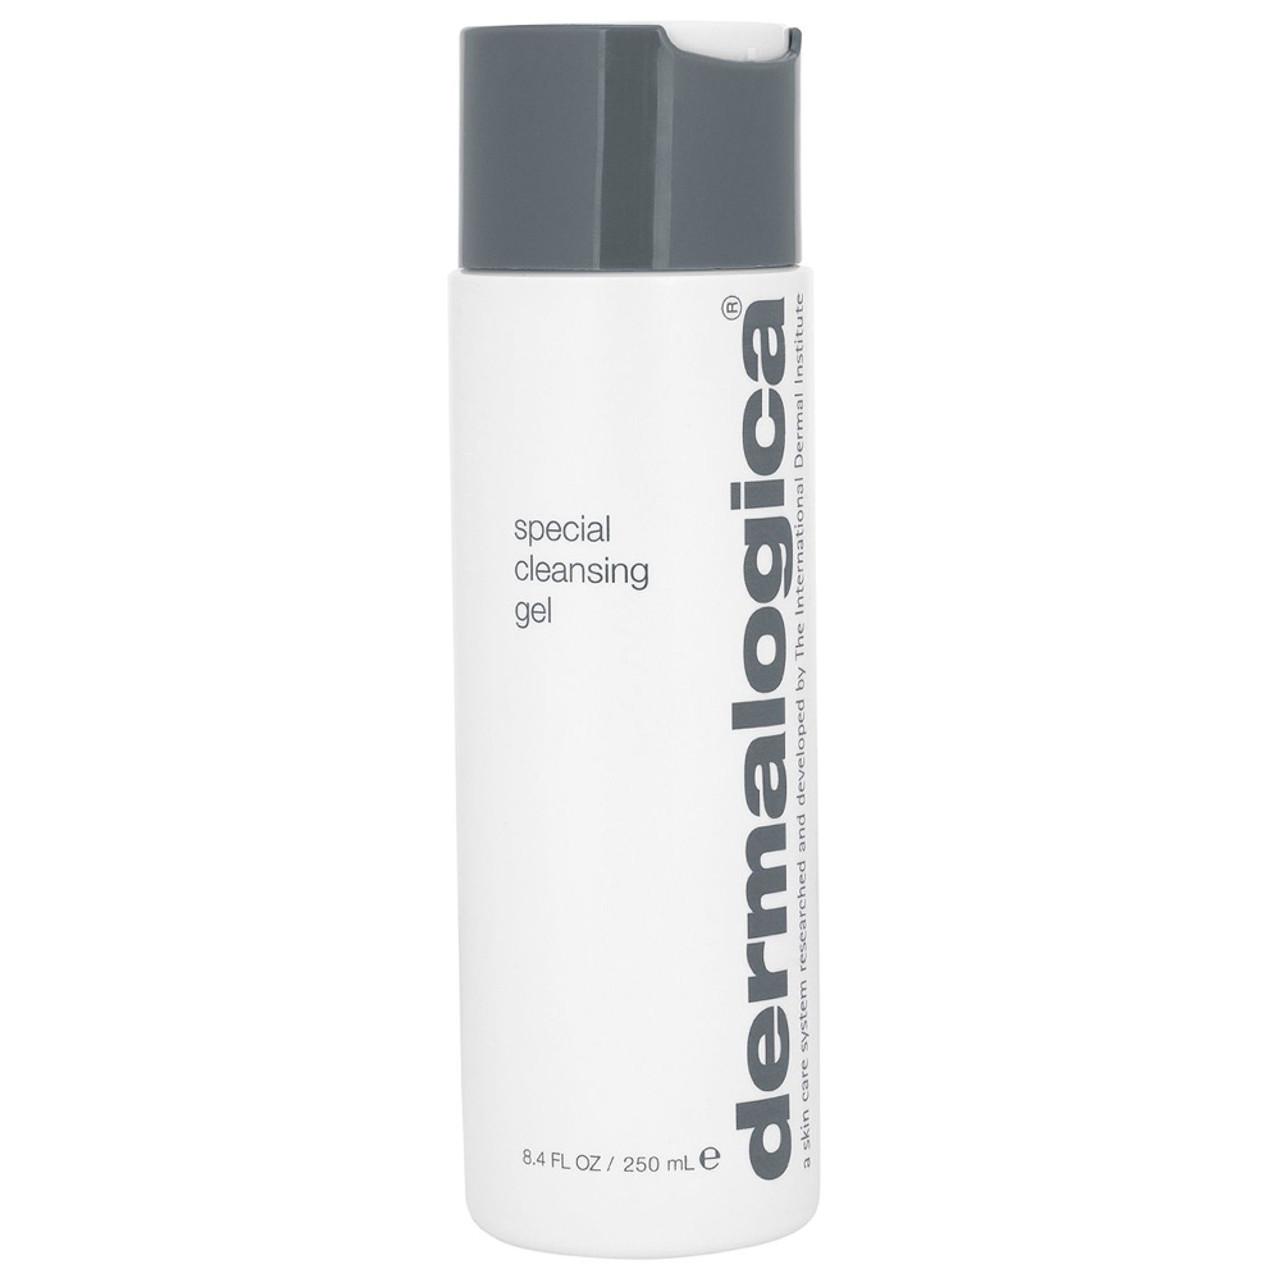 Dermalogica Special Cleansing Gel 8.4 oz